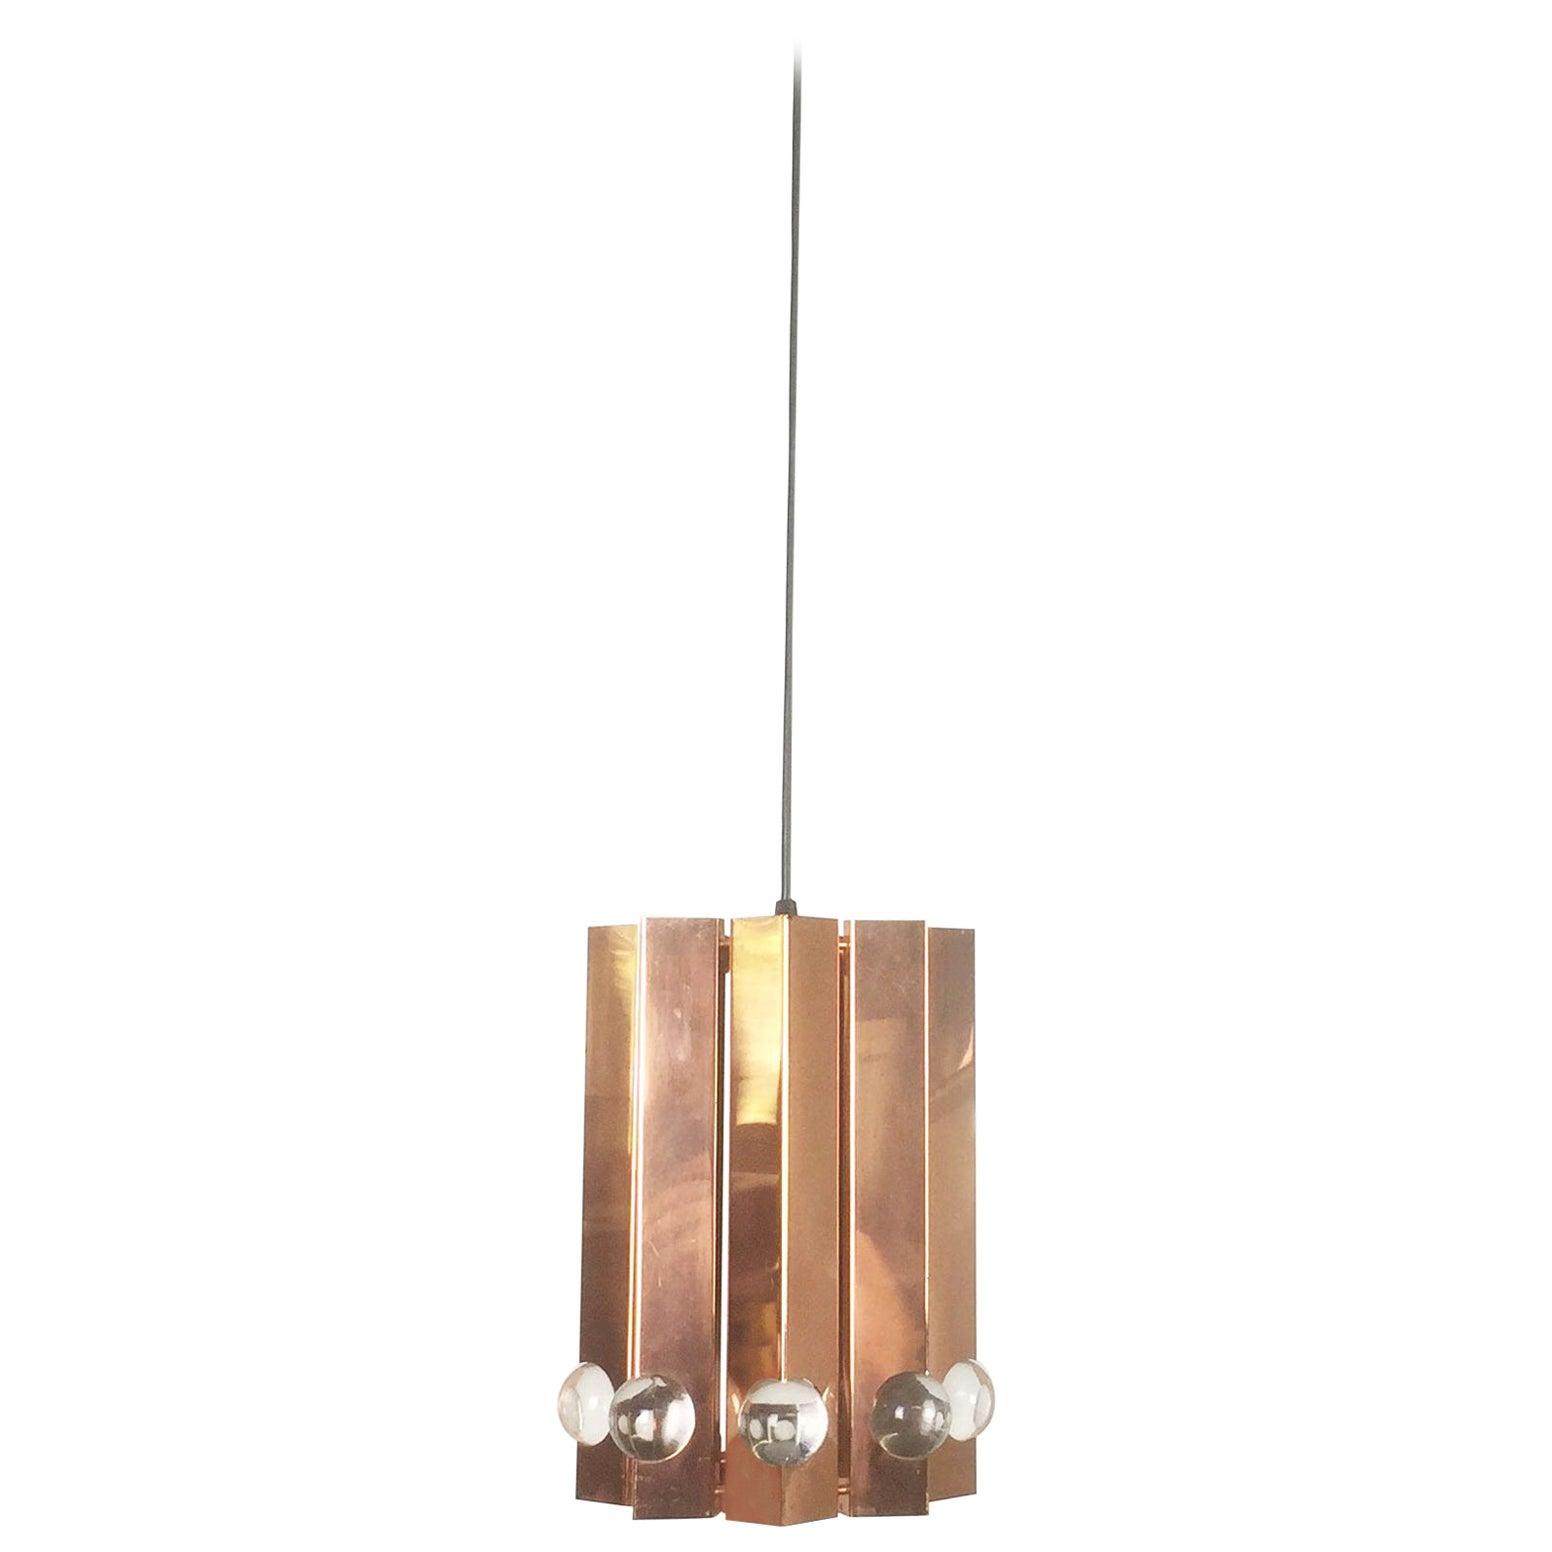 Scandinavian Danish Hanging Lamp in Copper with Glass Balls, 1960s